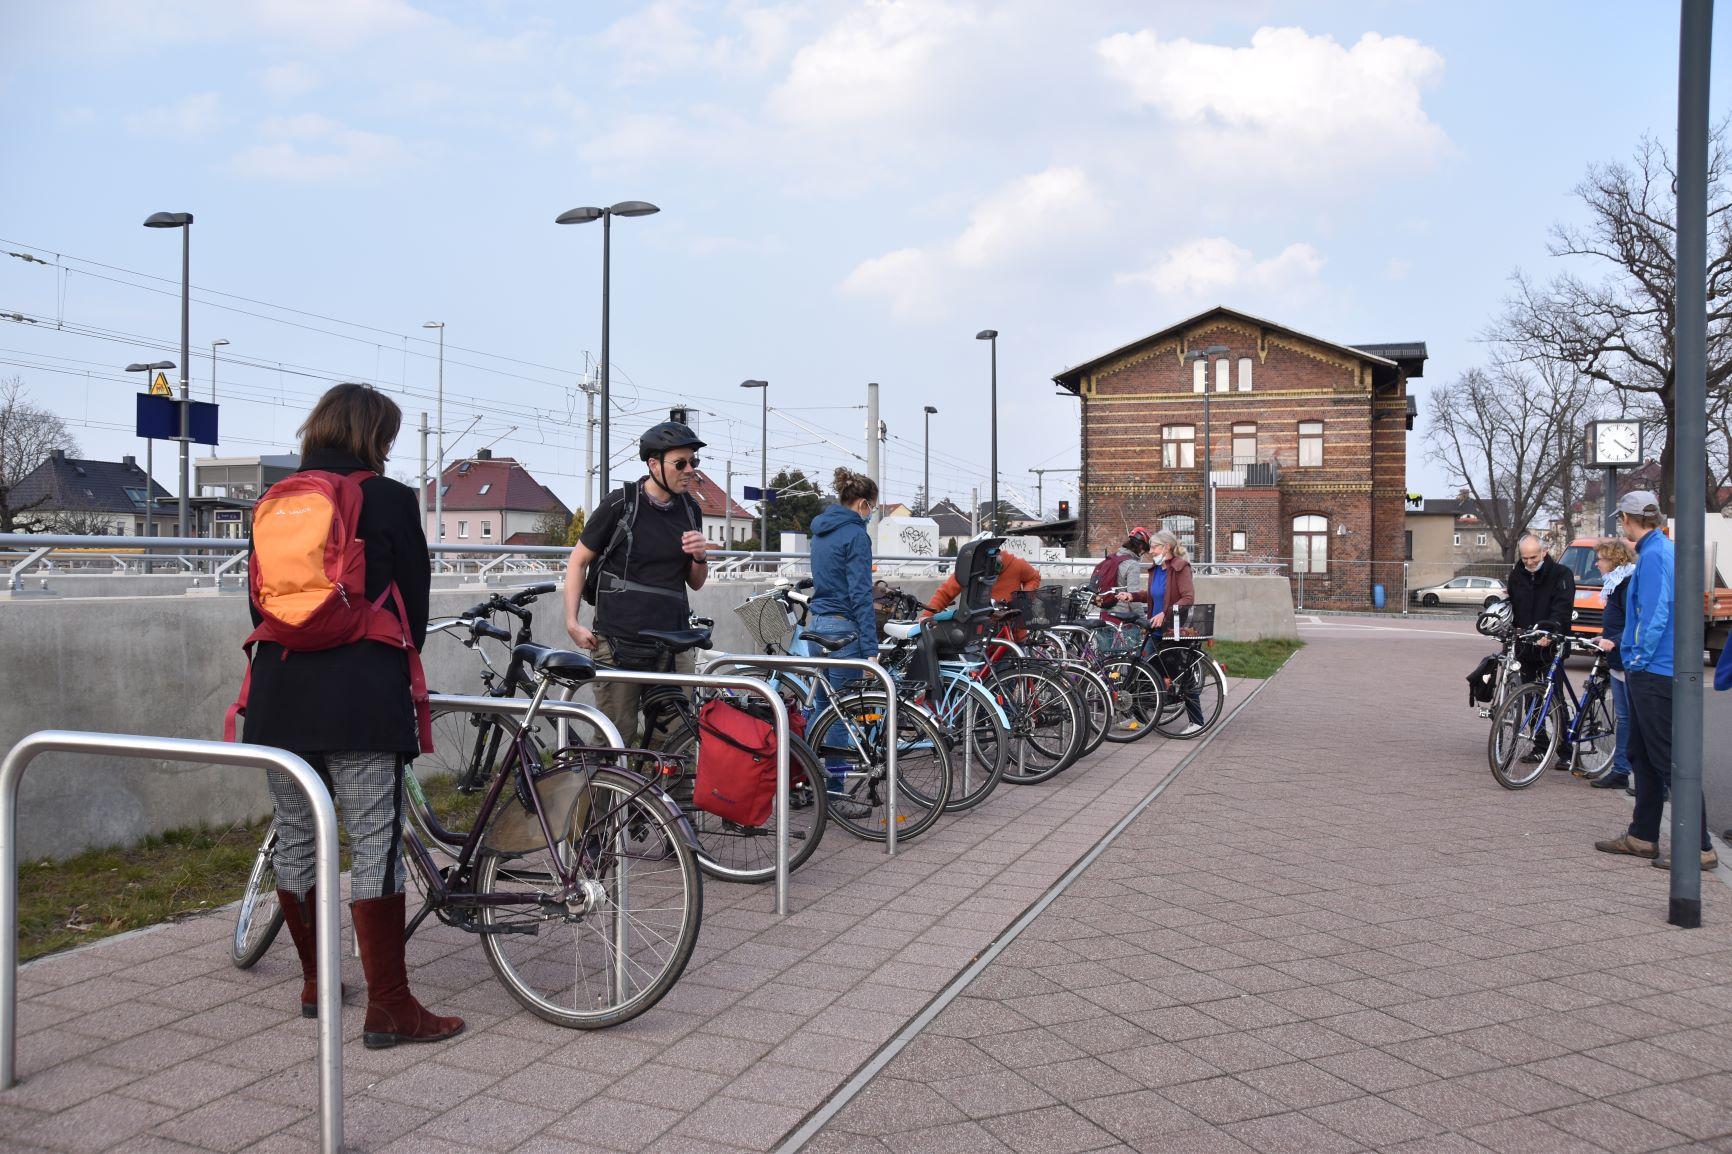 Fahrradtest am Bahnhof in Taucha